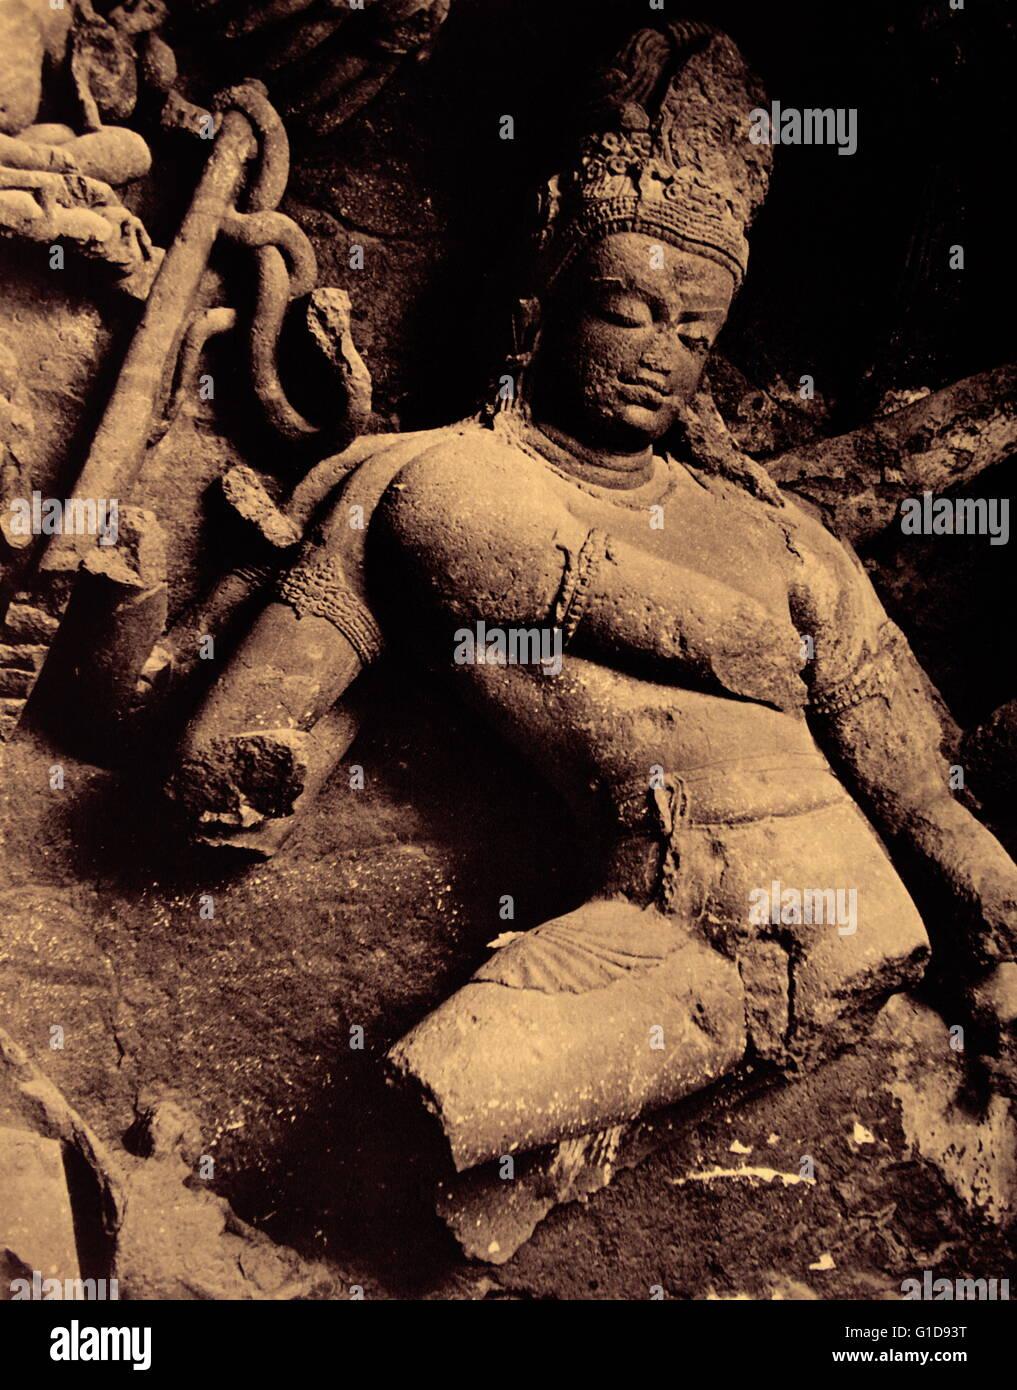 Shiva as Nataraja (Cosmic dancer)at the Elephanta Caves (on Elephanta Island in Mumbai Harbour, India). Shiva as - Stock Image